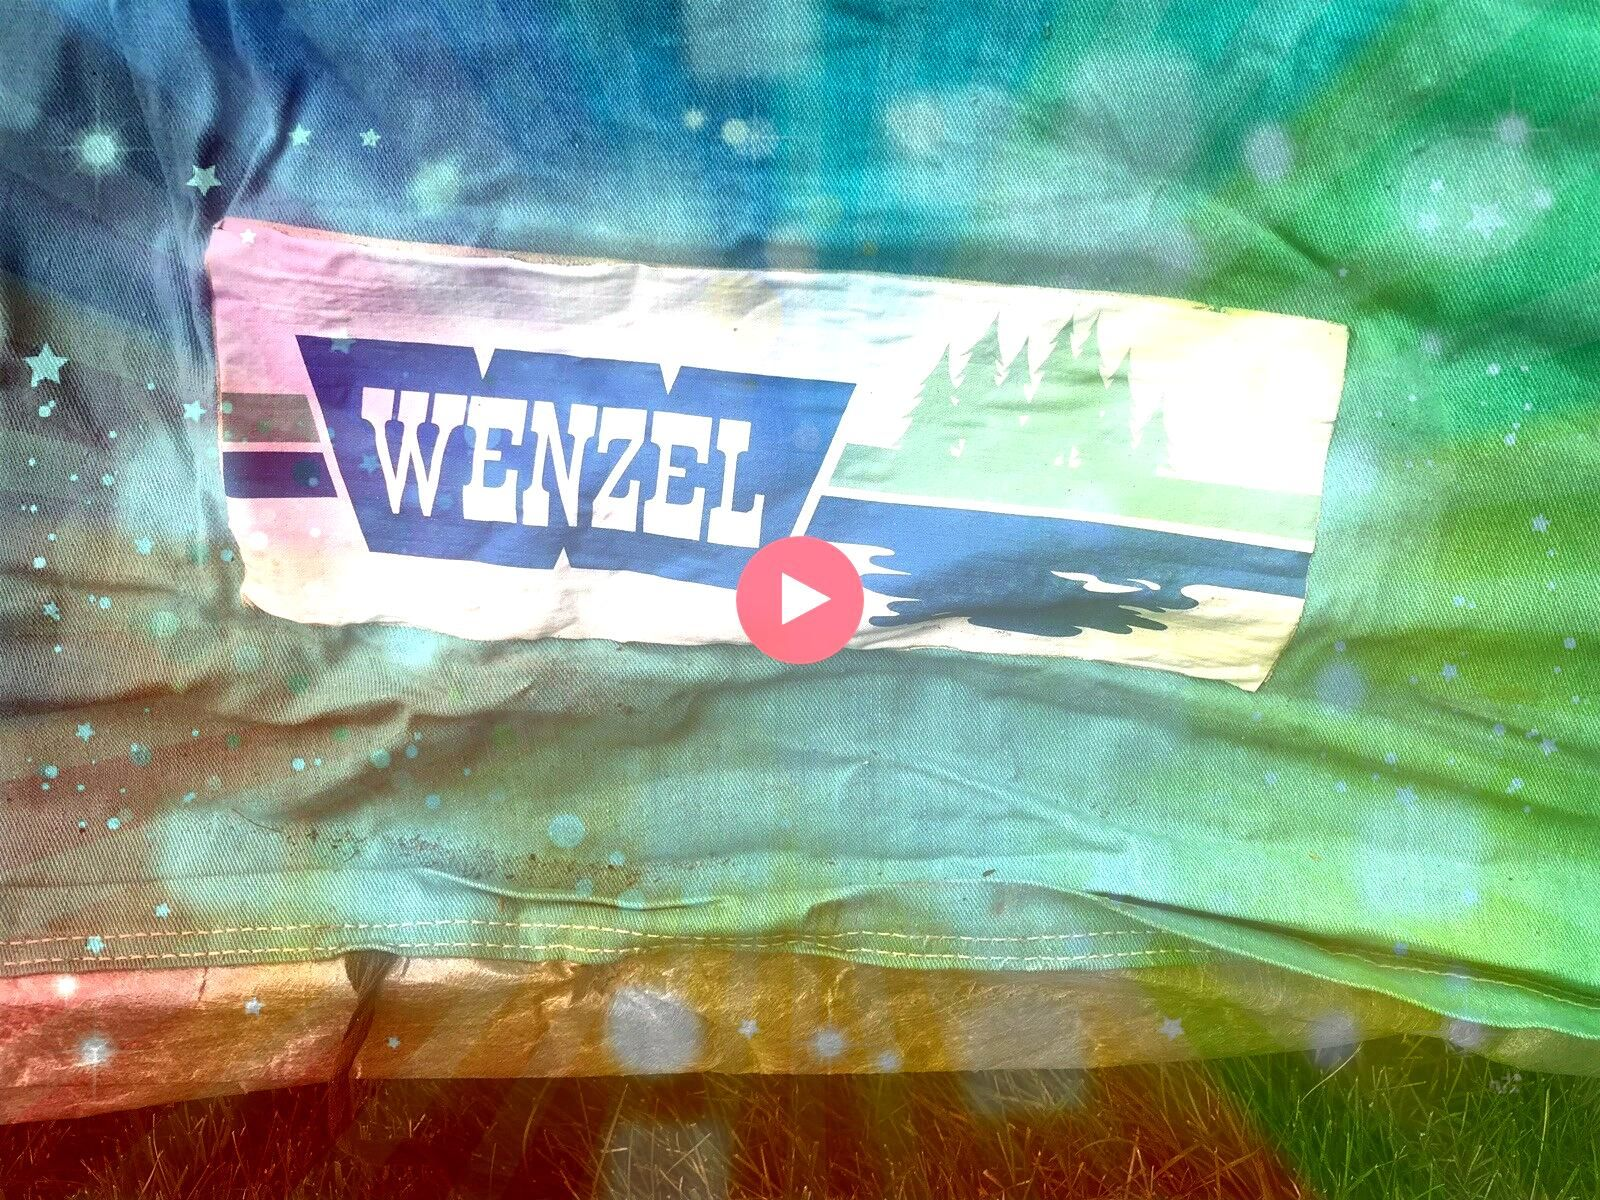 Wenzel Weekender Umbrella Tent No 02705 Canvas Original Box Missing 2 Poles 13999Vtg Wenzel Weekender Umbrella Tent No 02705 Canvas Original Box Missing 2 Poles 13999 The...